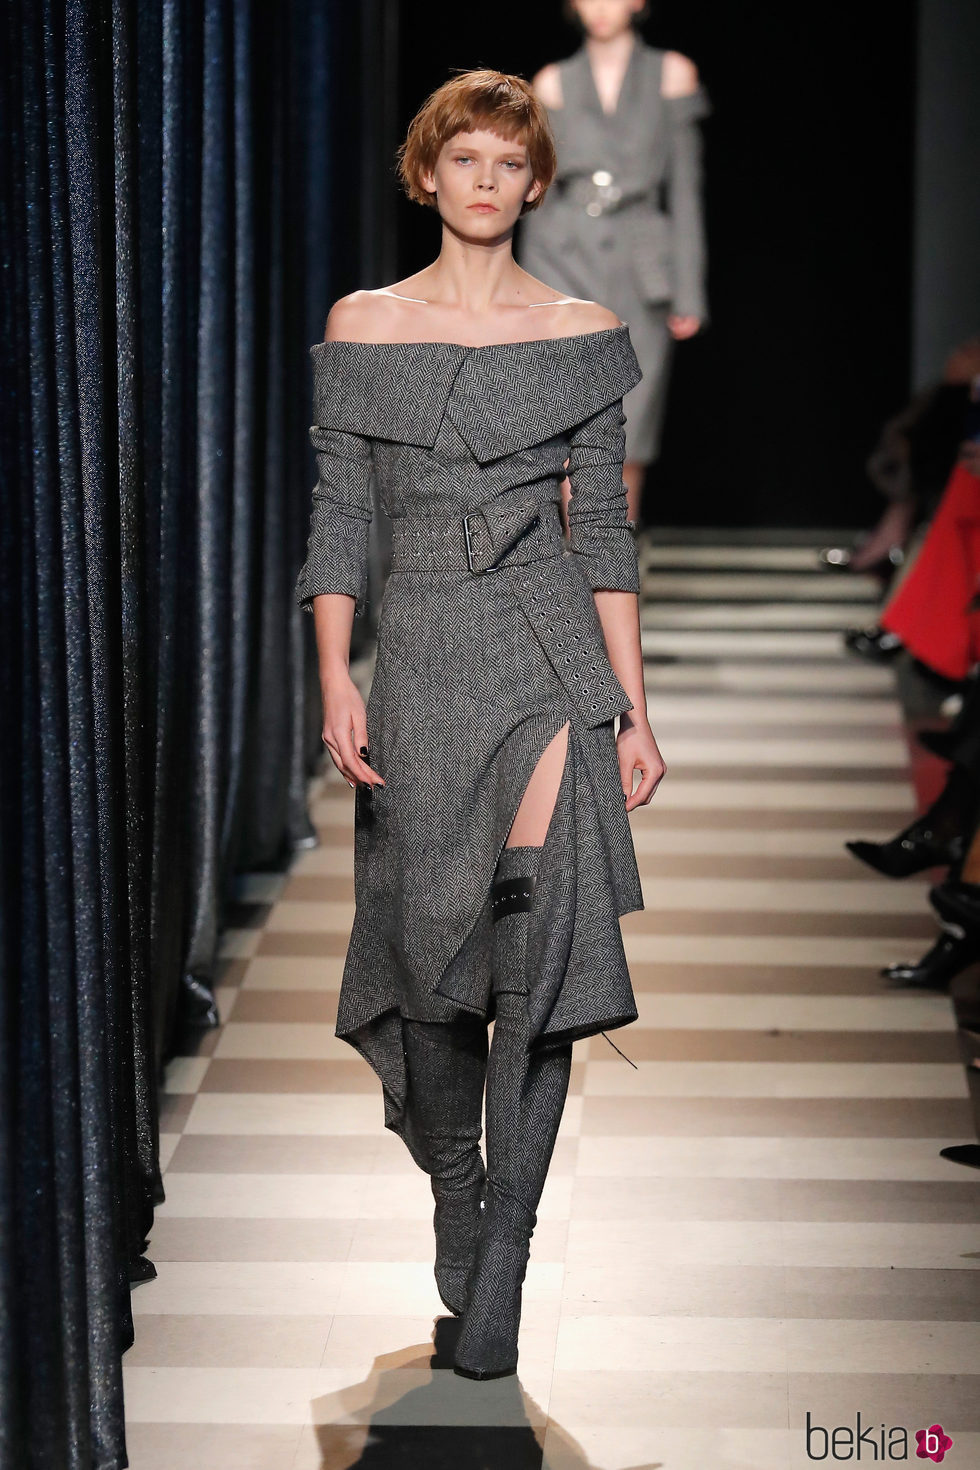 Vestido asimétrico de Monse otoño/invierno 2017/2018 en la New York Fashion Week